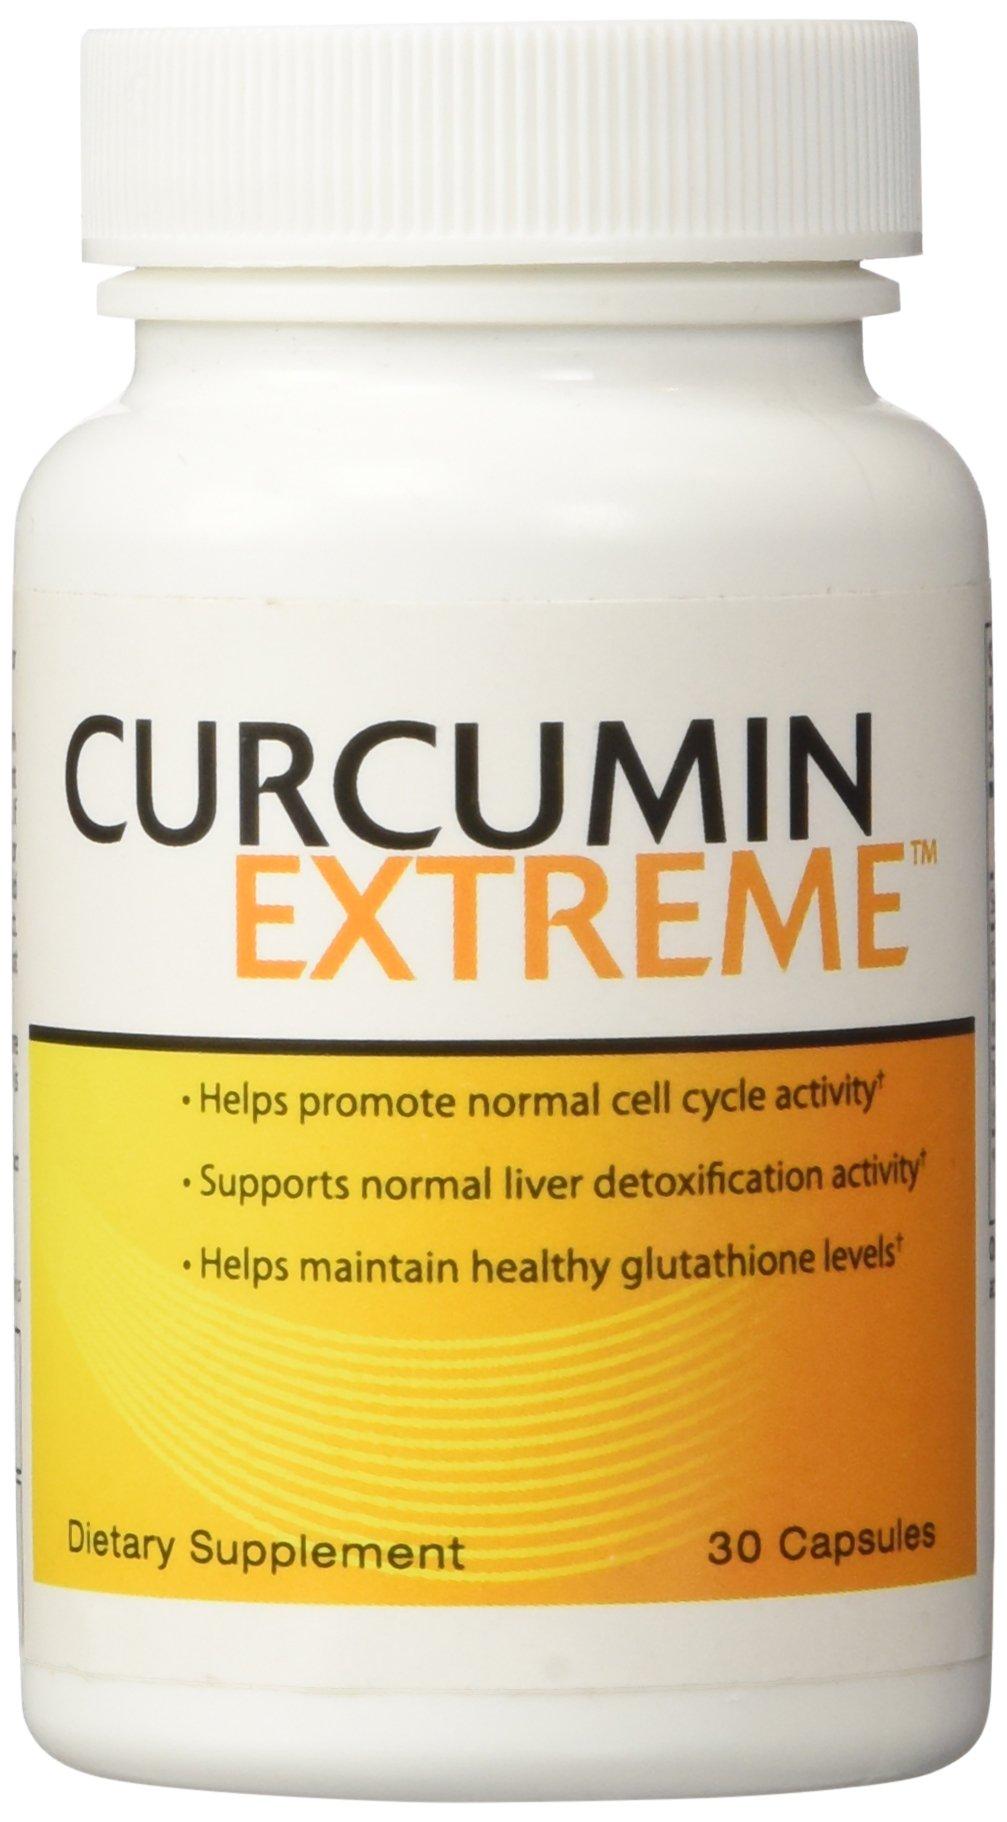 Curcumin Extreme, Curcumin BCM-95 400mg, 30 Capsules